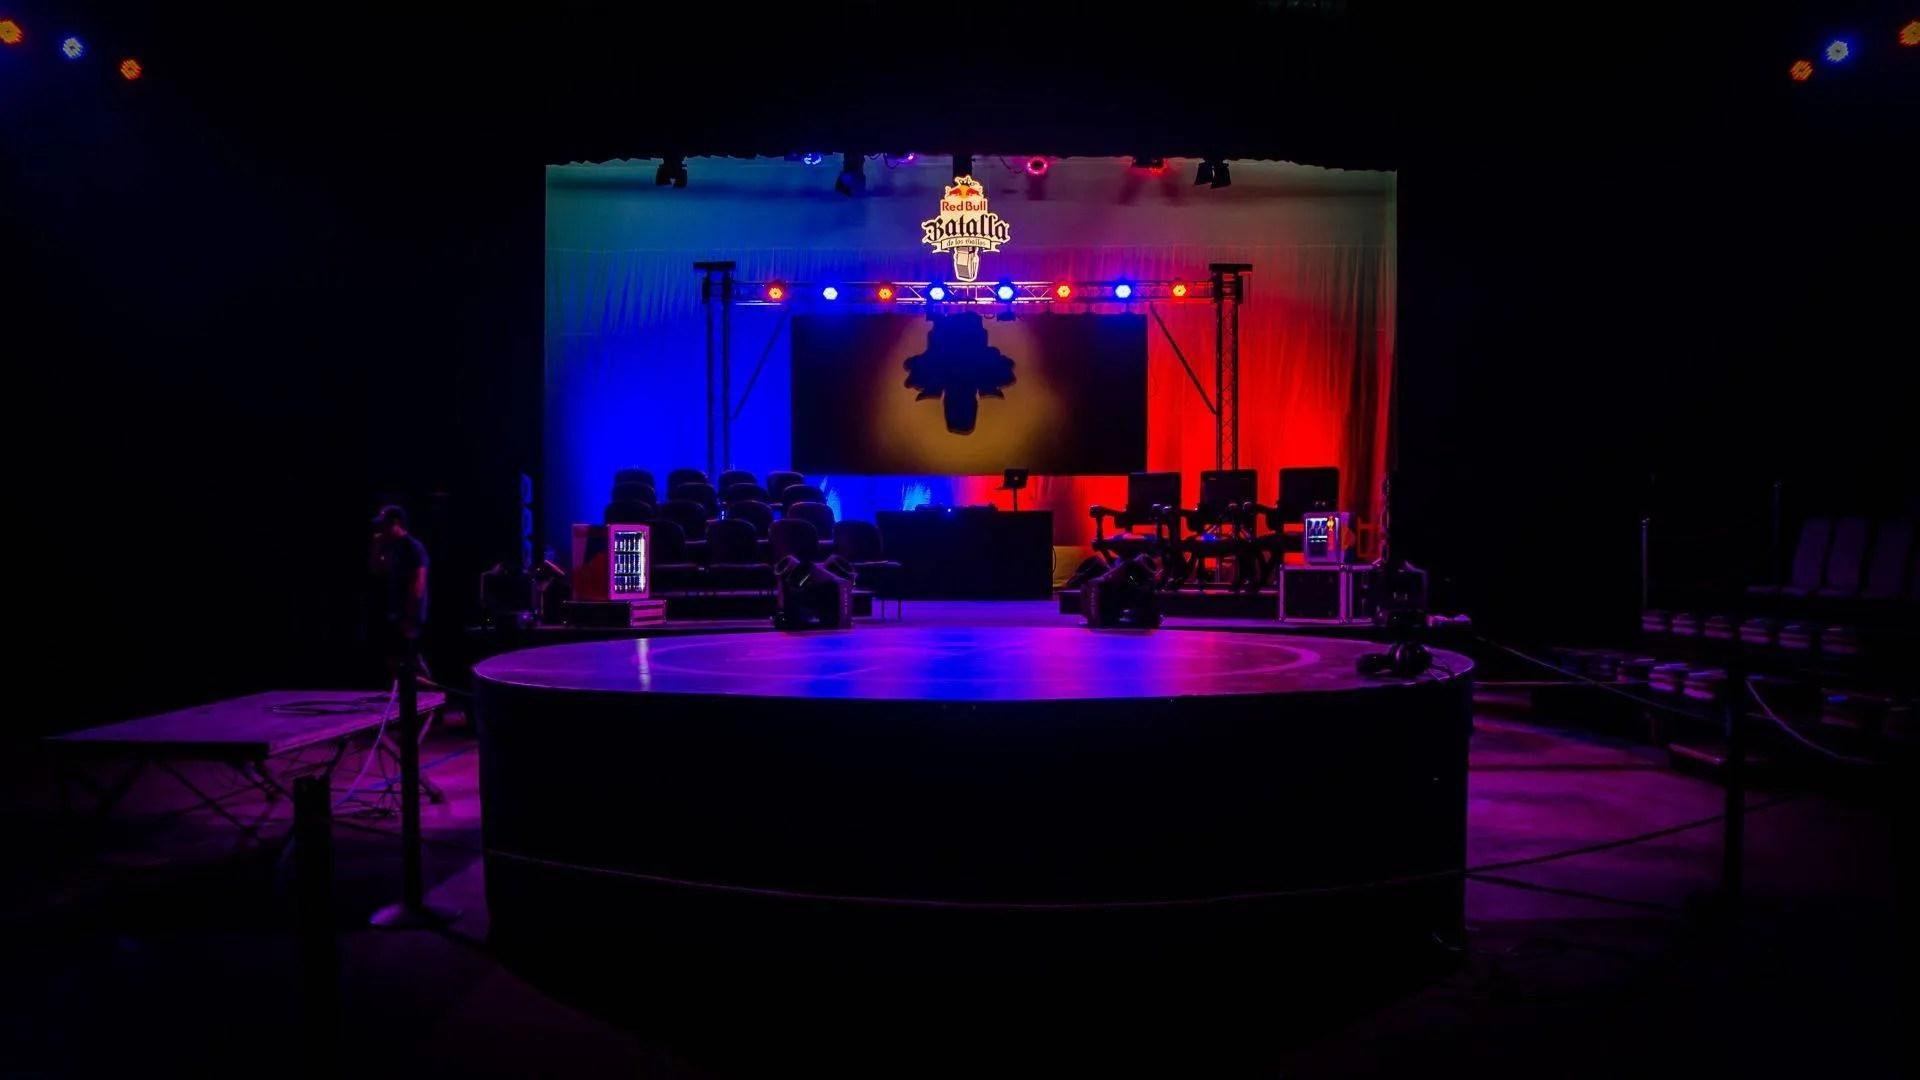 La Final Nacional de la Red Bull Batalla de los Gallos Cuba 2018 tuvo lugar en el Teatro Bertolt Brecht. Foto: Kako Escalona / Magazine AM:PM.